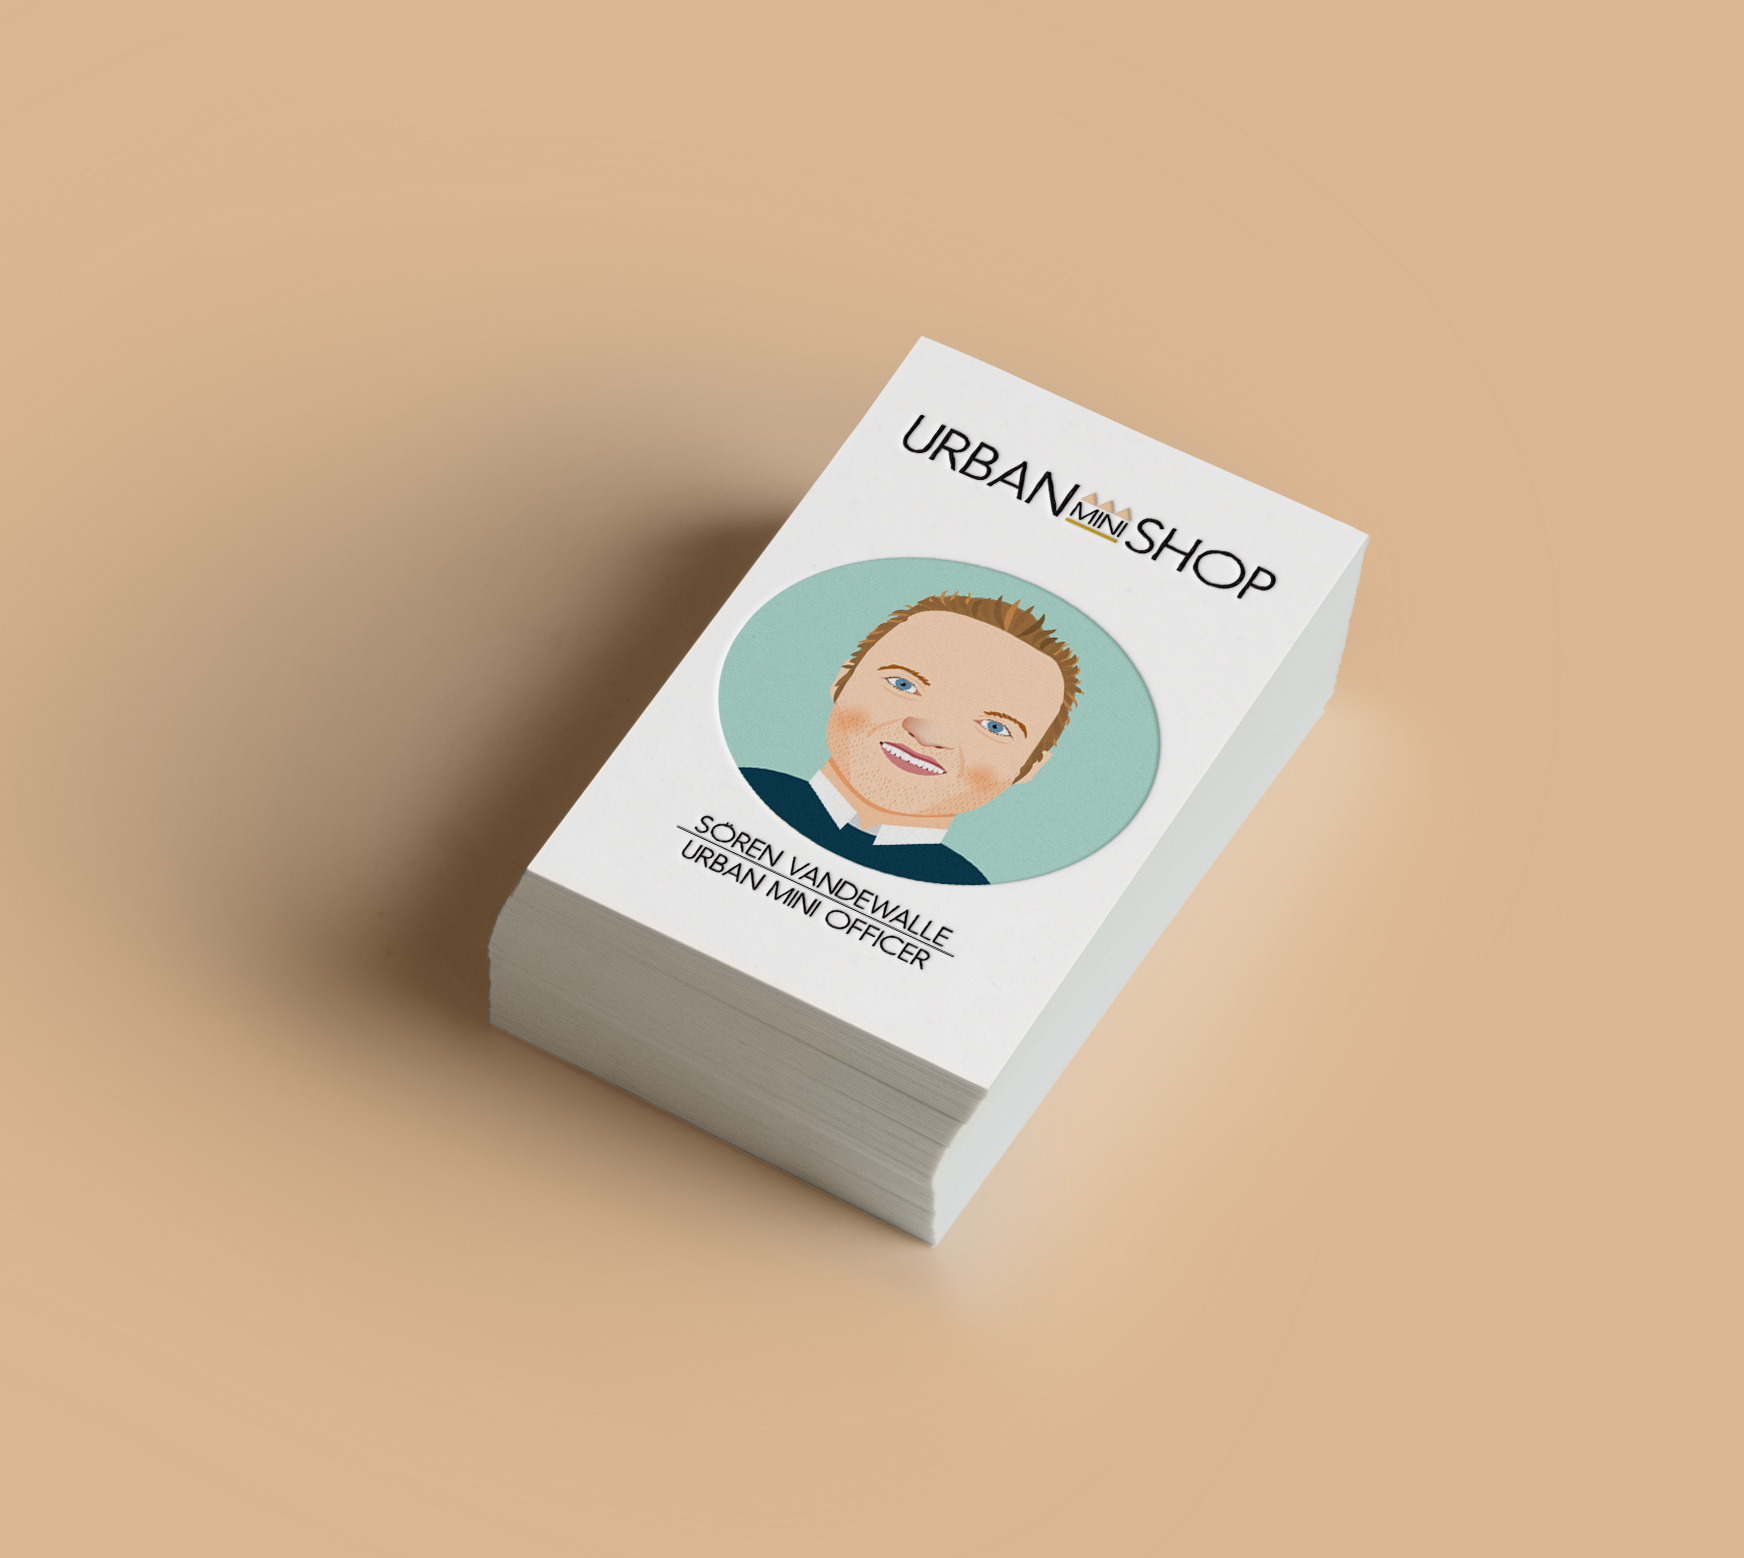 naamkaart-urban-mini-shop-officer.jpg